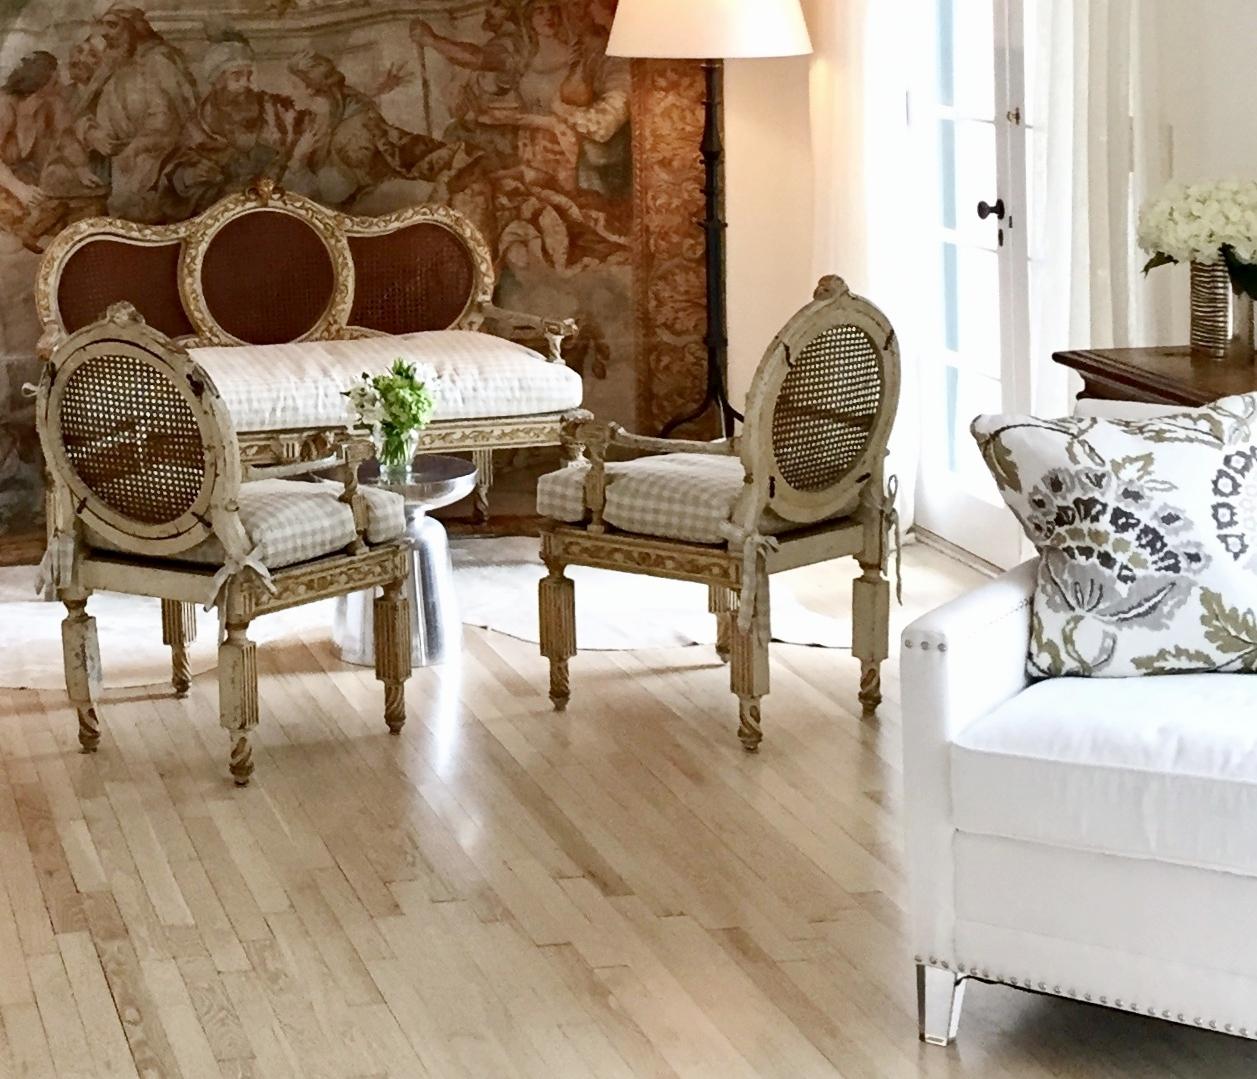 Designs by Alina, Alina de Albergaria, Santa Barbara, Lifestyle, blog, interiors, designs, designer